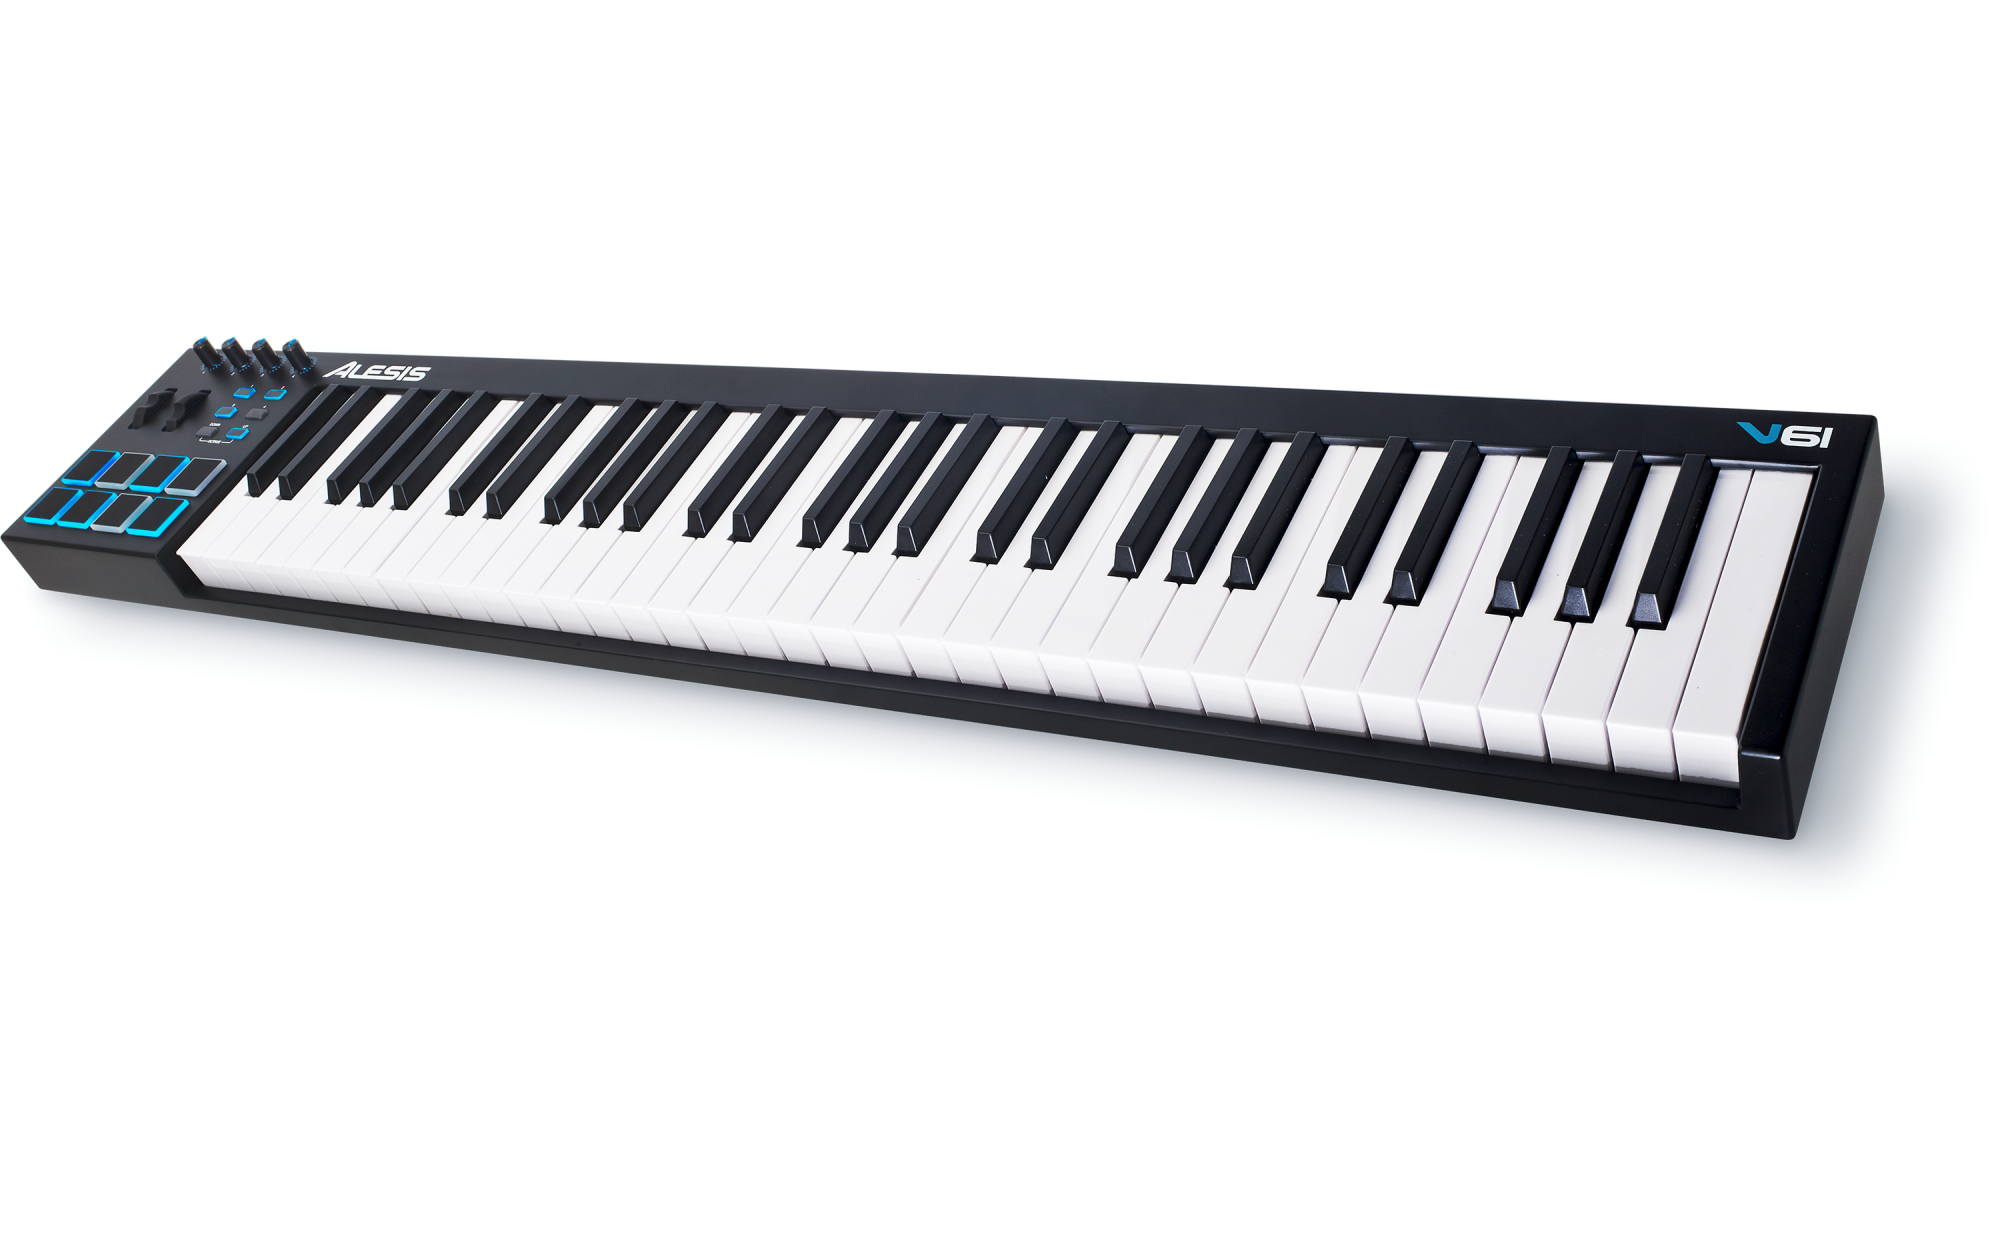 Alesis V61 61 Key USB Music Keyboard Controller w/ Pads